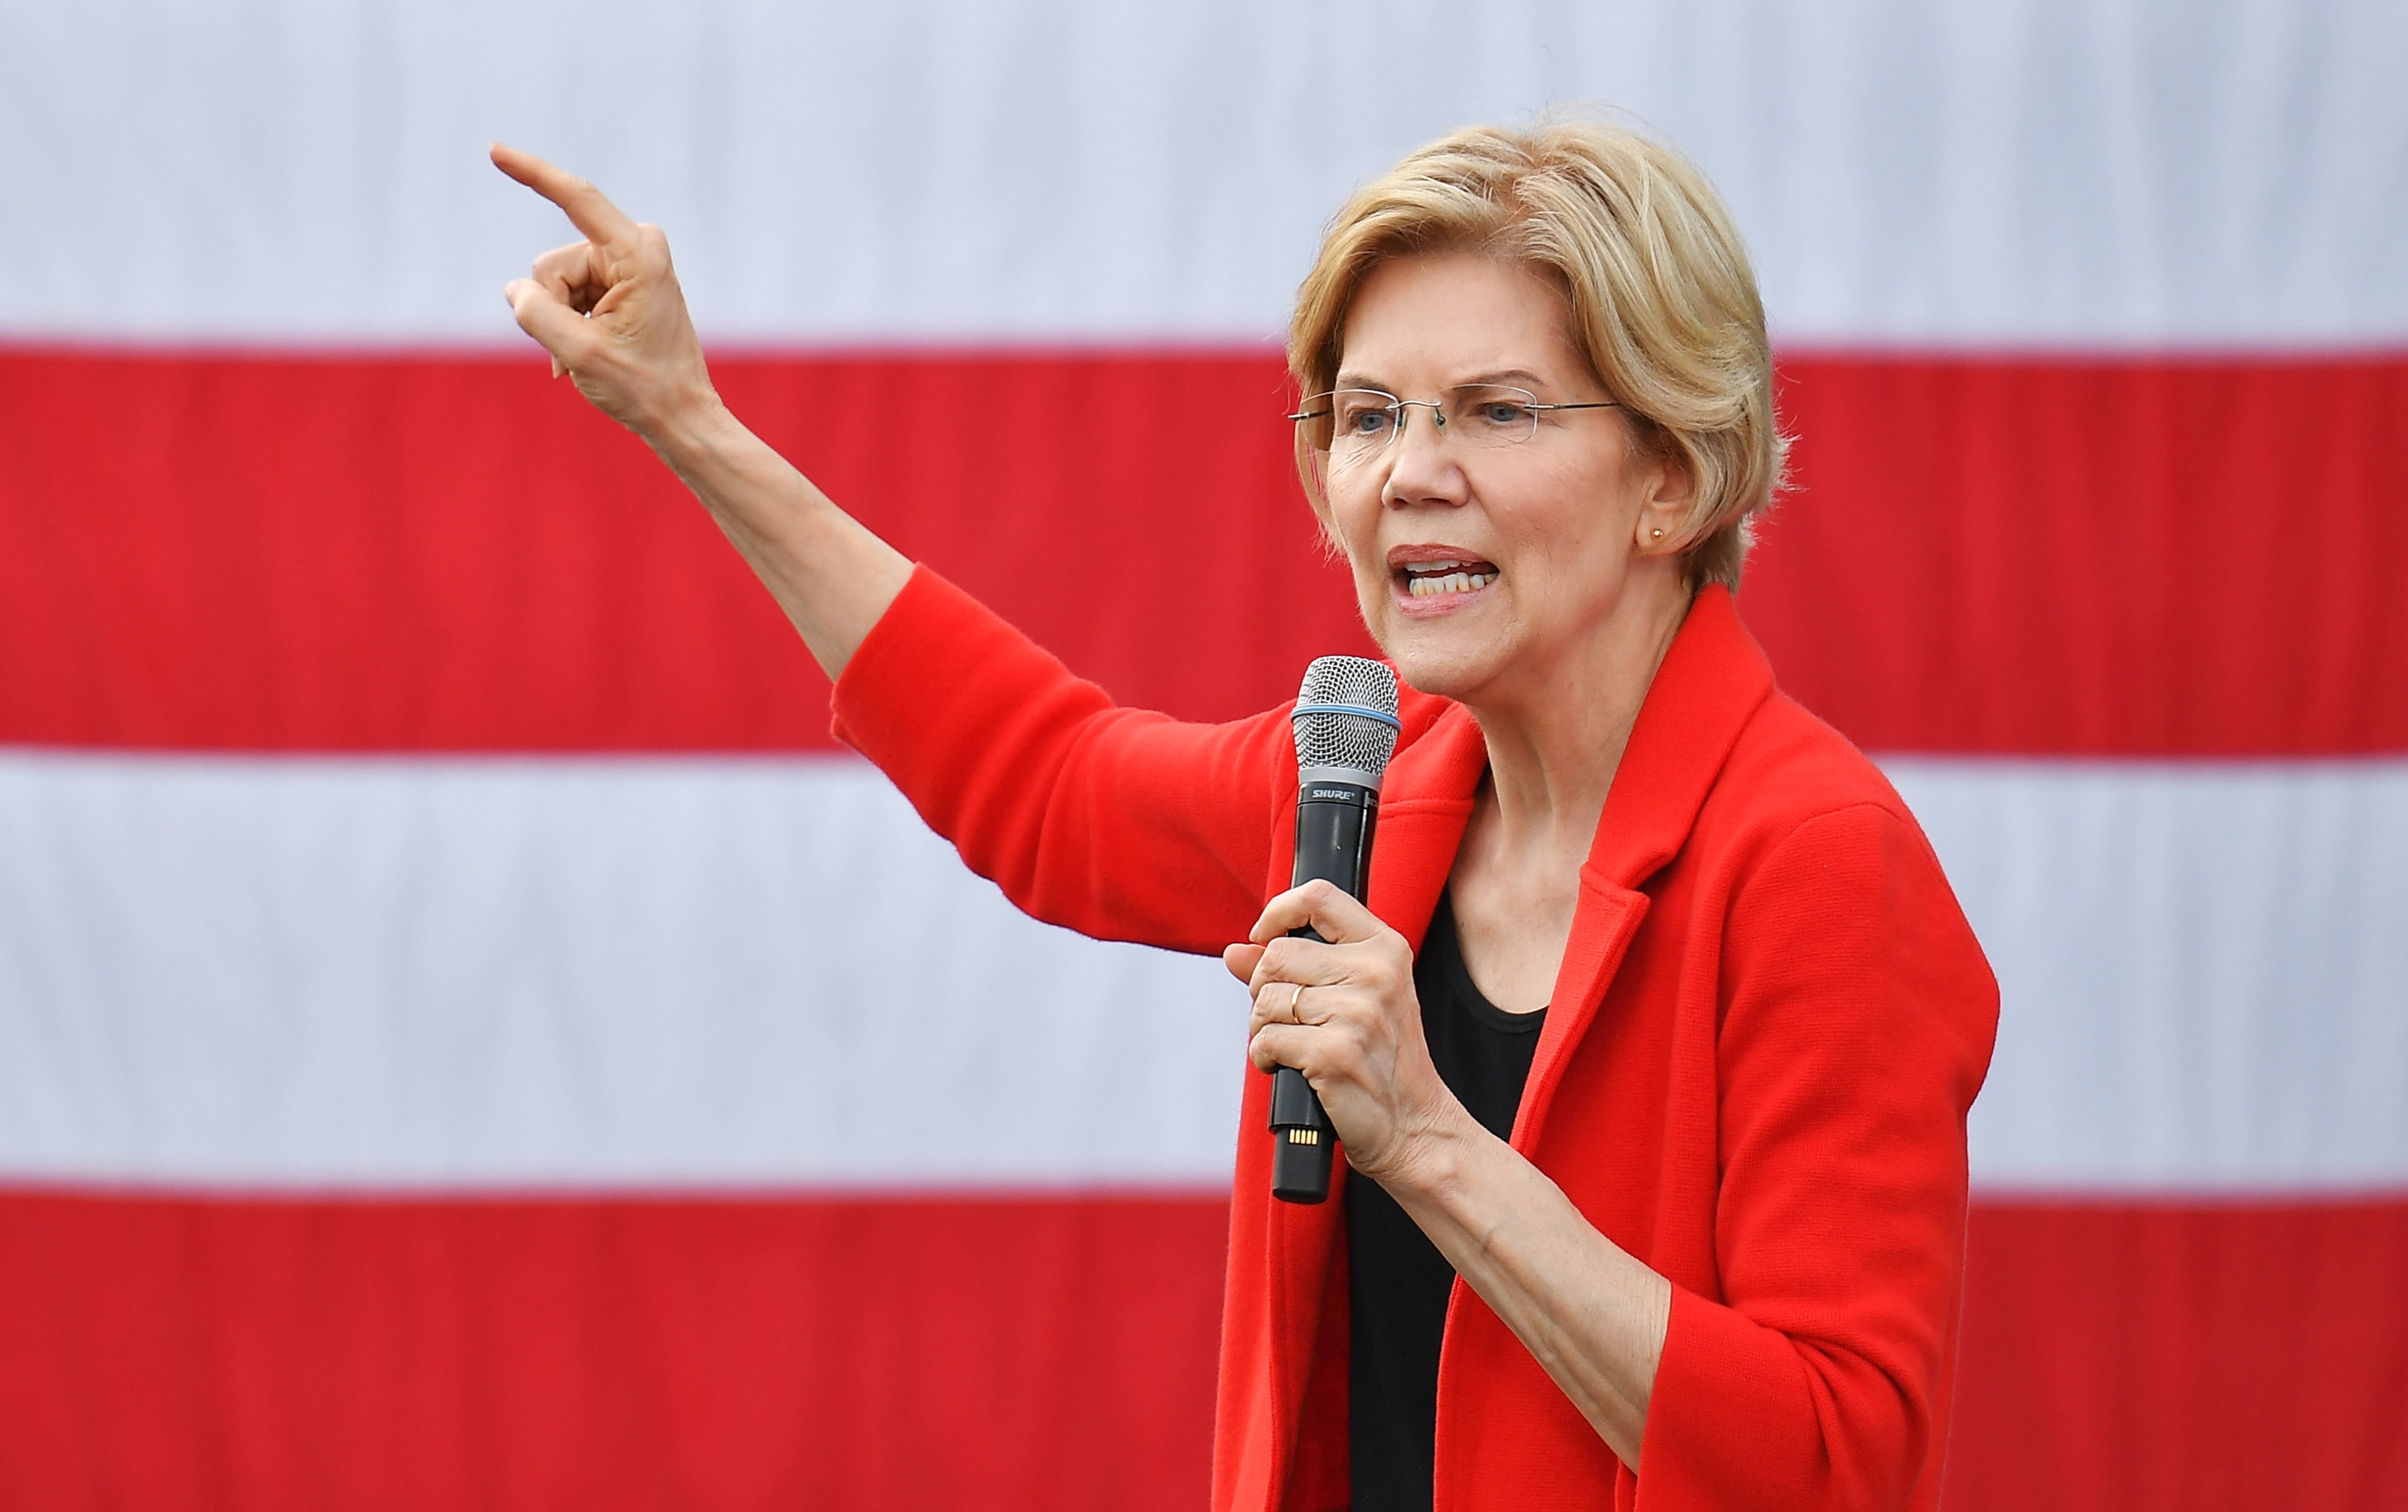 Elizabeth Warren and Alexandria Ocasio-Cortez target Treasury Secretary Steven Mnuchin over Sears bankruptcy